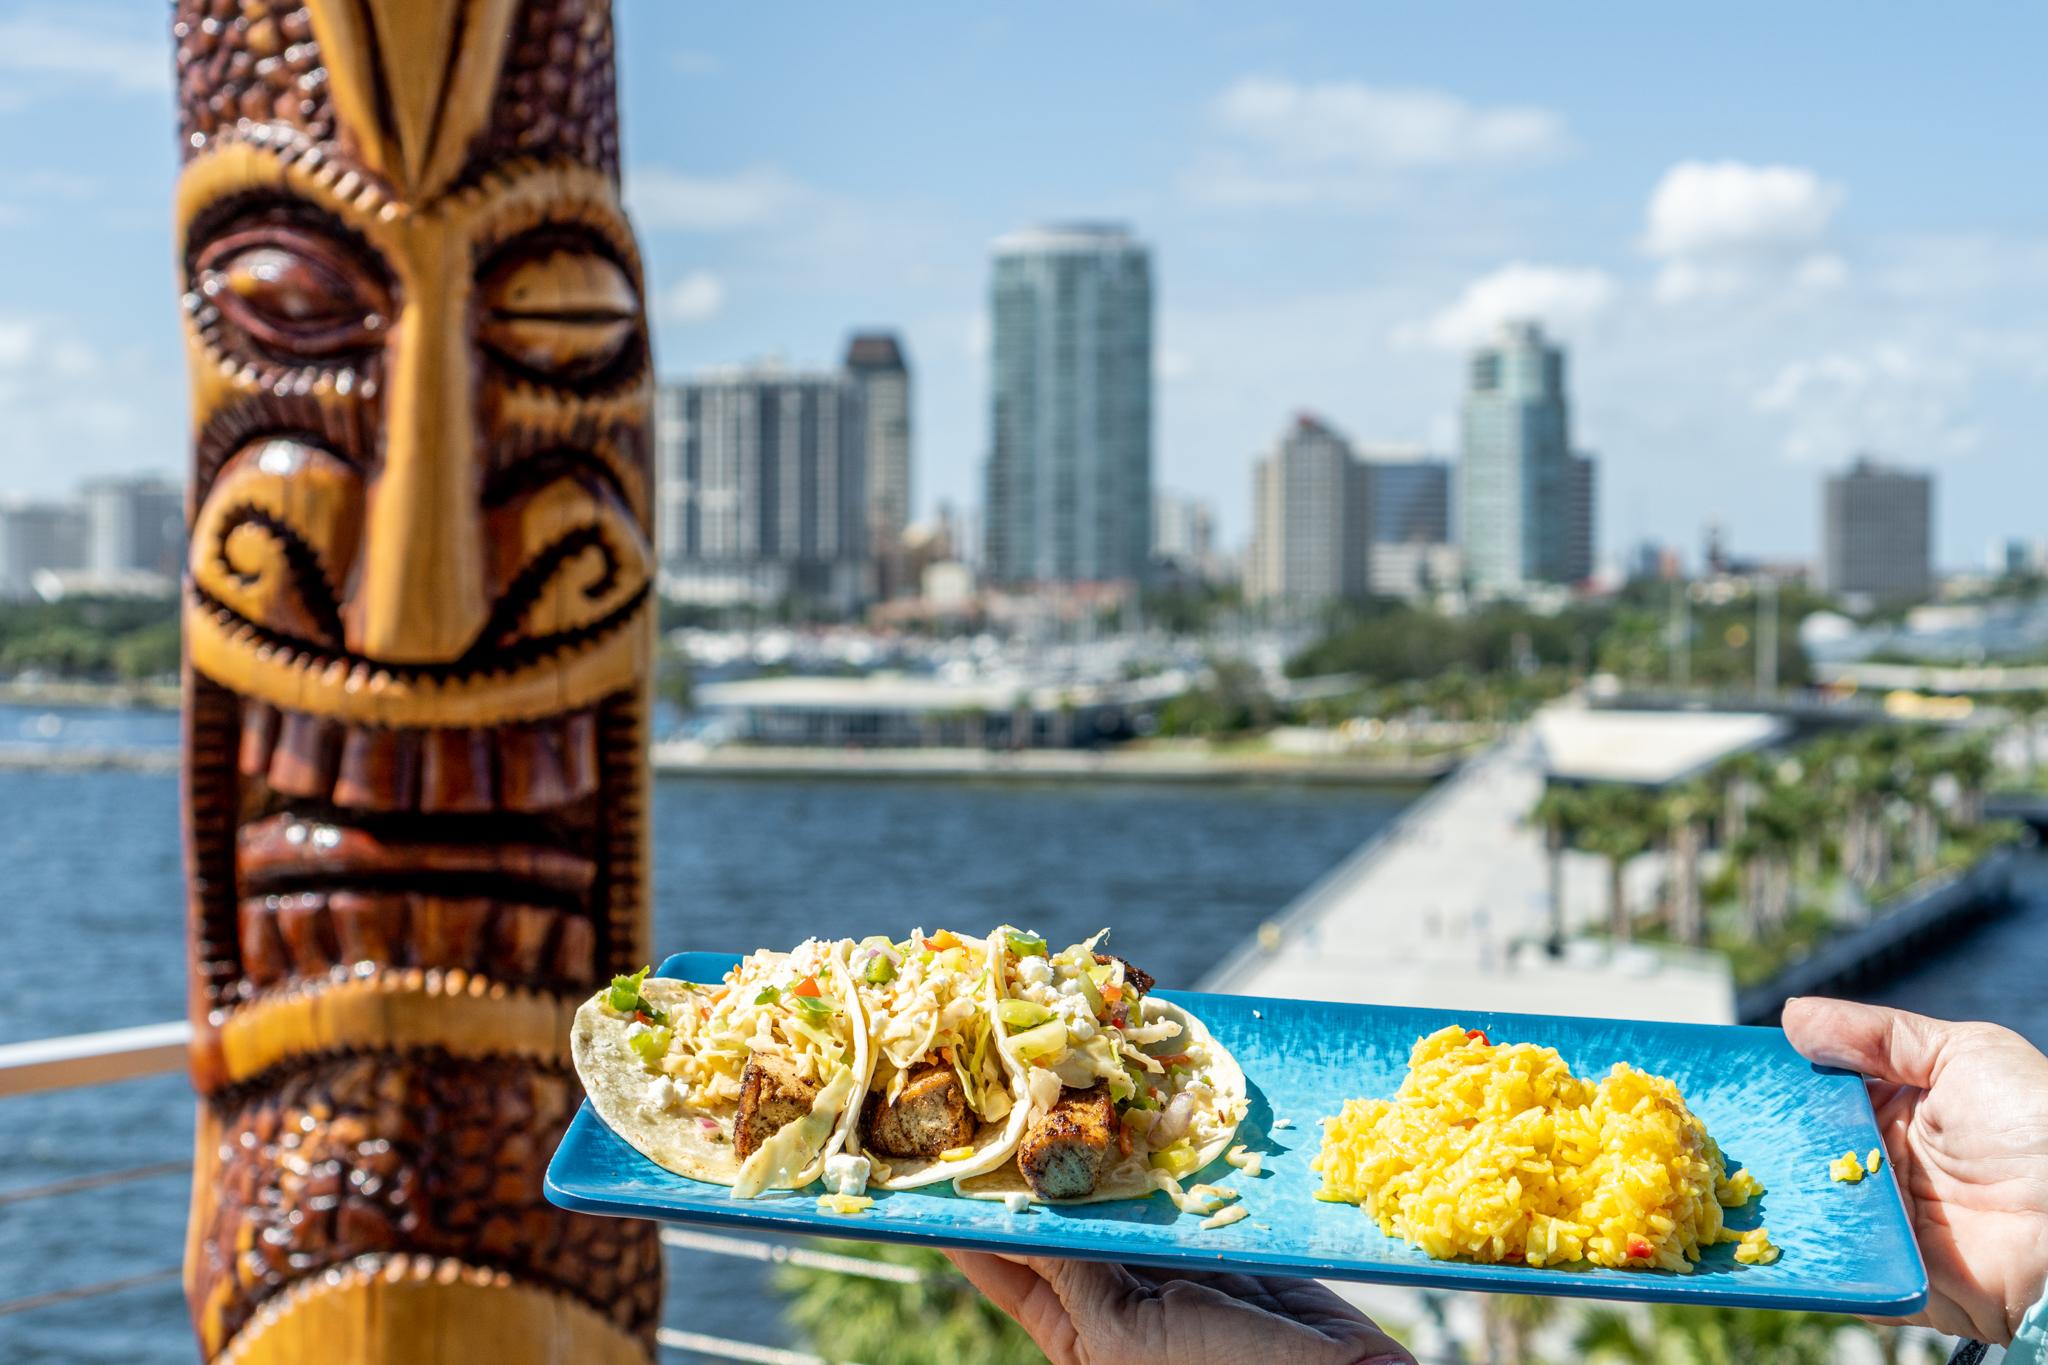 Pier Teaki Fish Tacos and Views